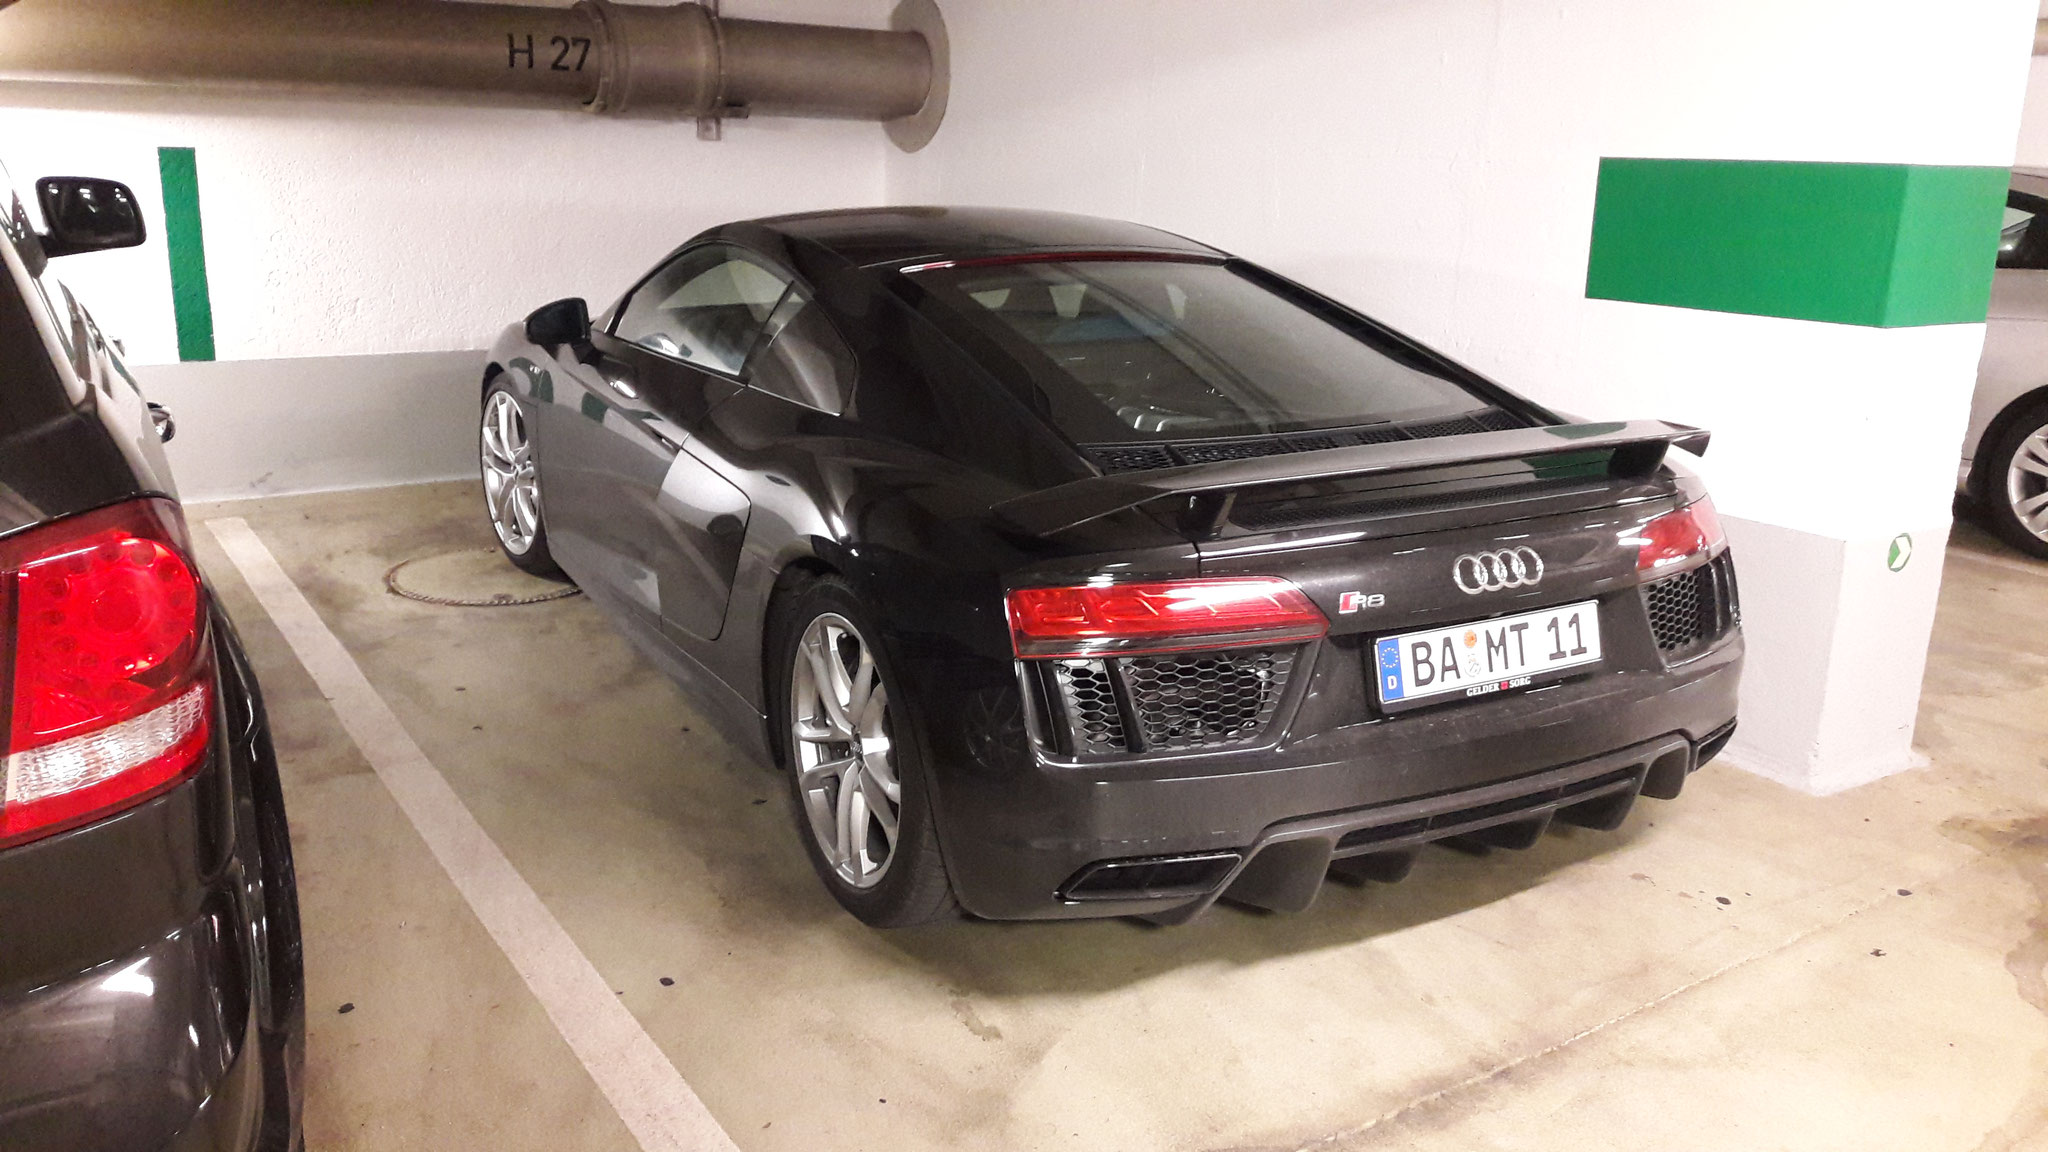 Audi R8 V10 - BA-MT-11